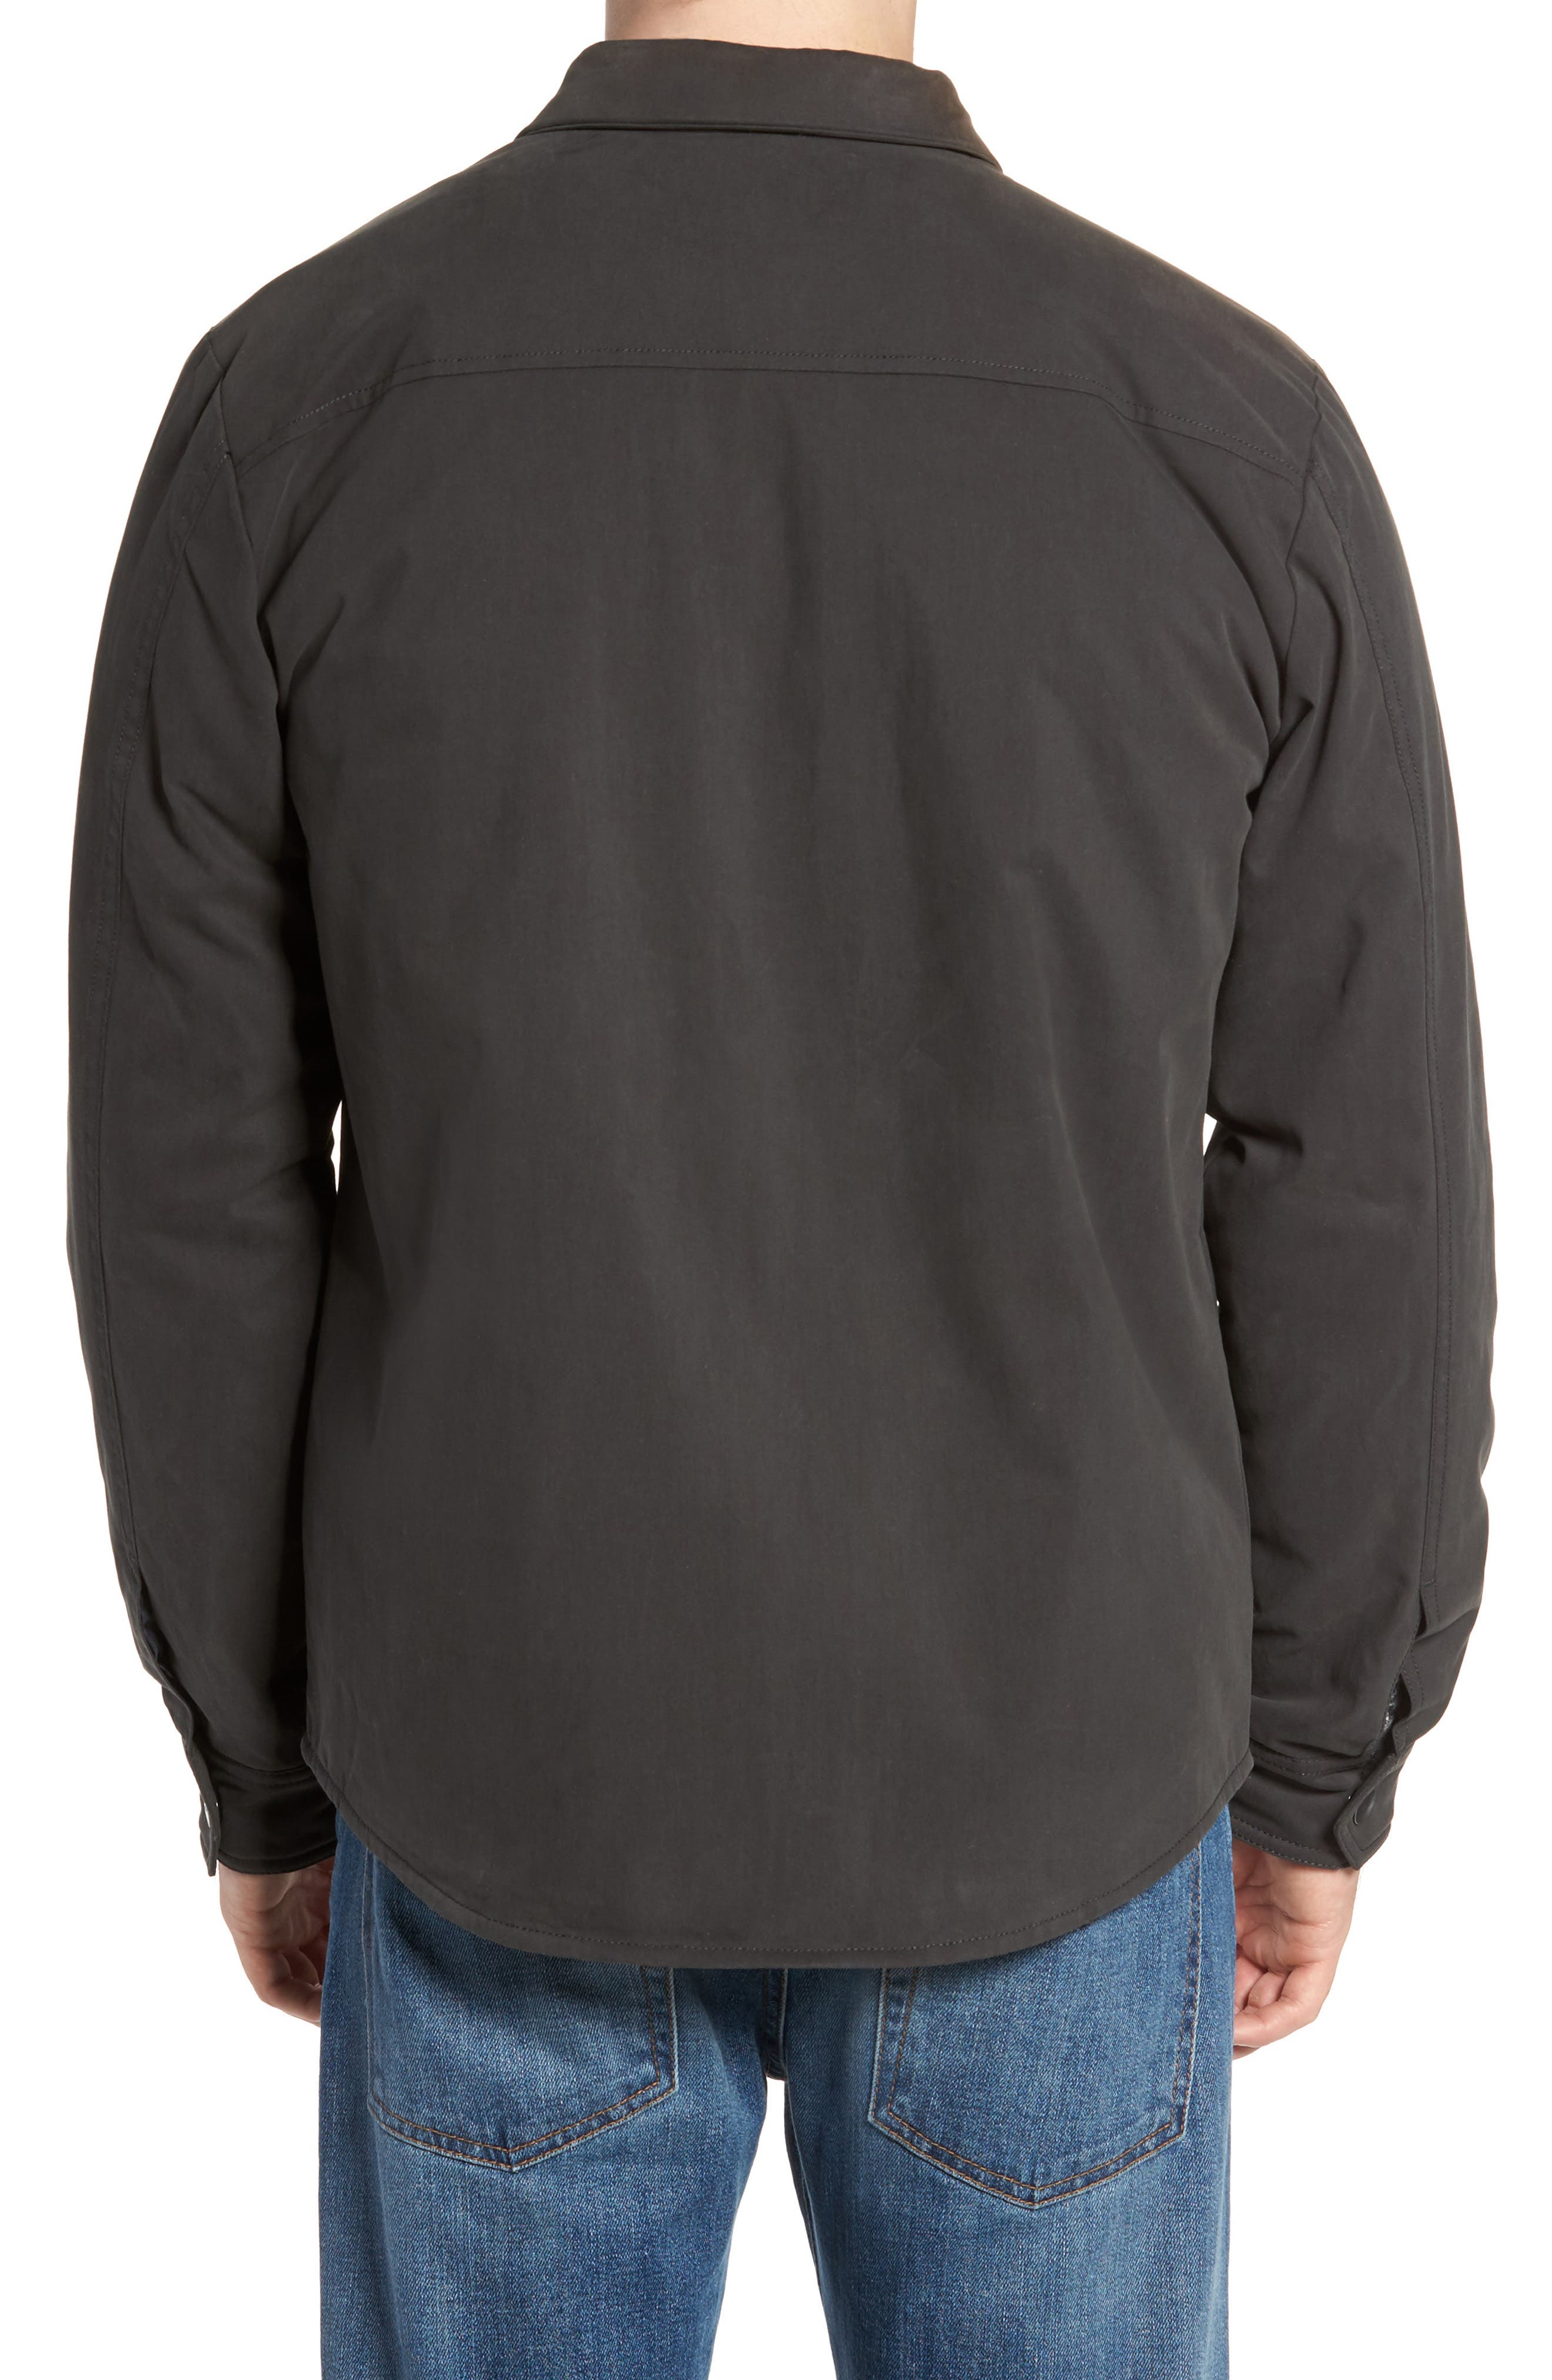 Officer's Shirt Jacket,                             Alternate thumbnail 2, color,